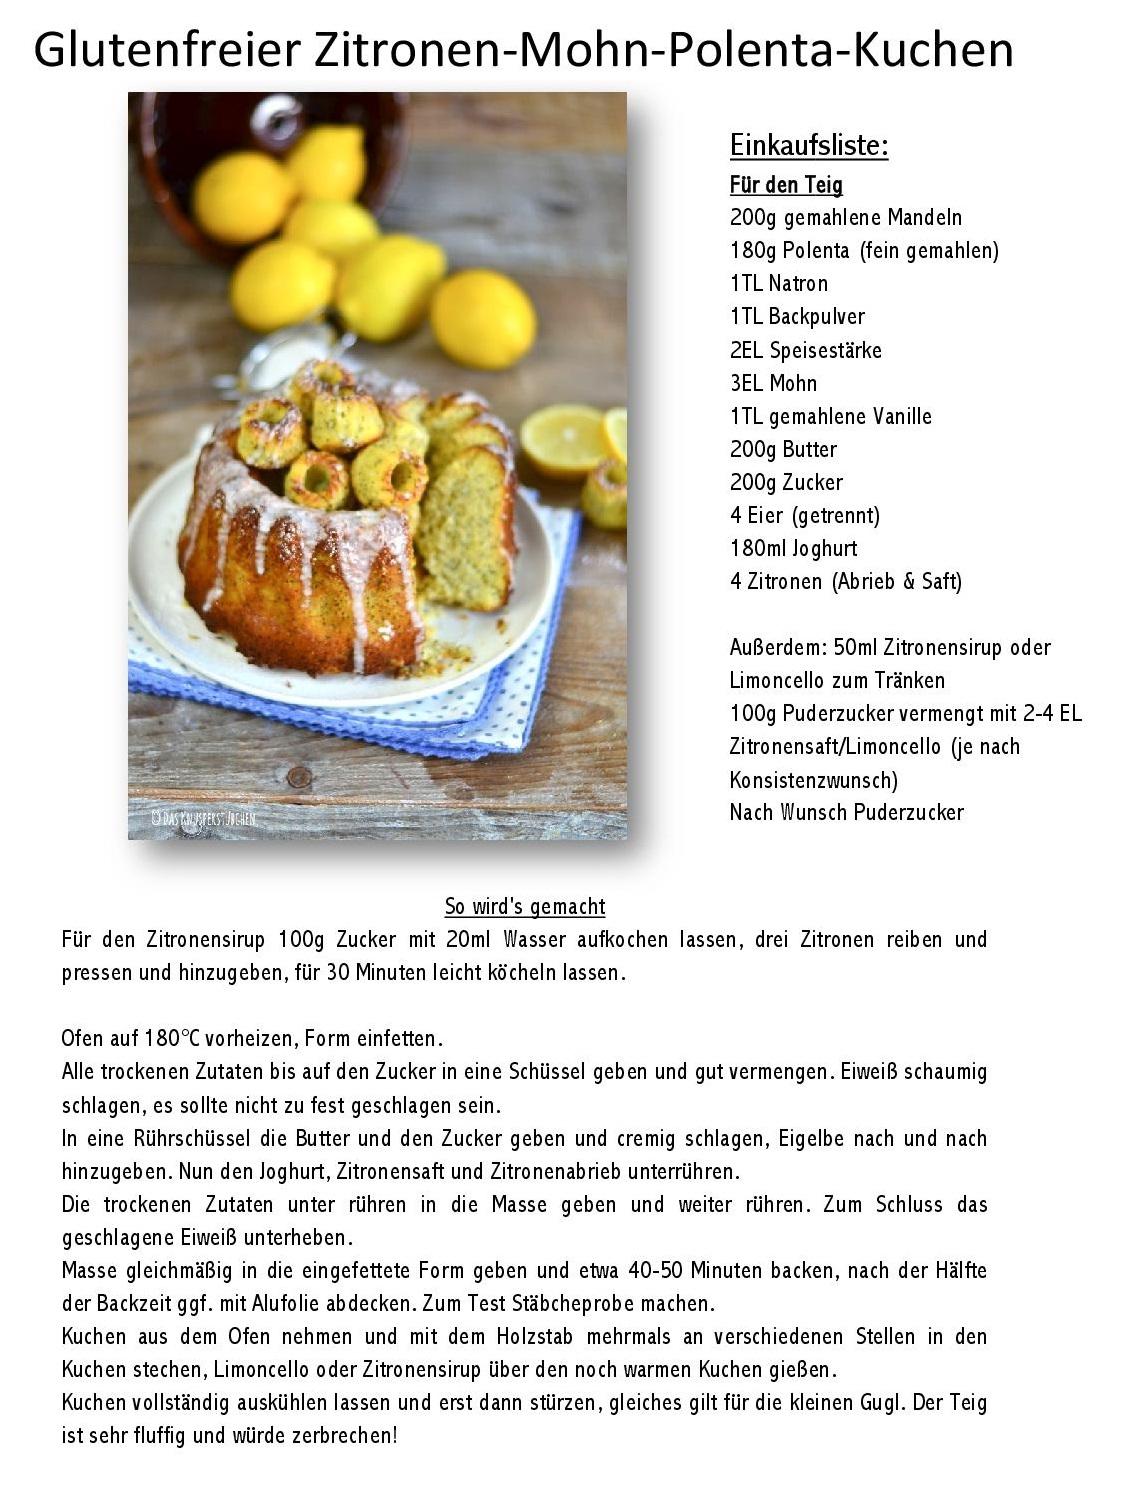 Glutenfrei - Zitronen-Mohn-Polenta-Kuchen-001